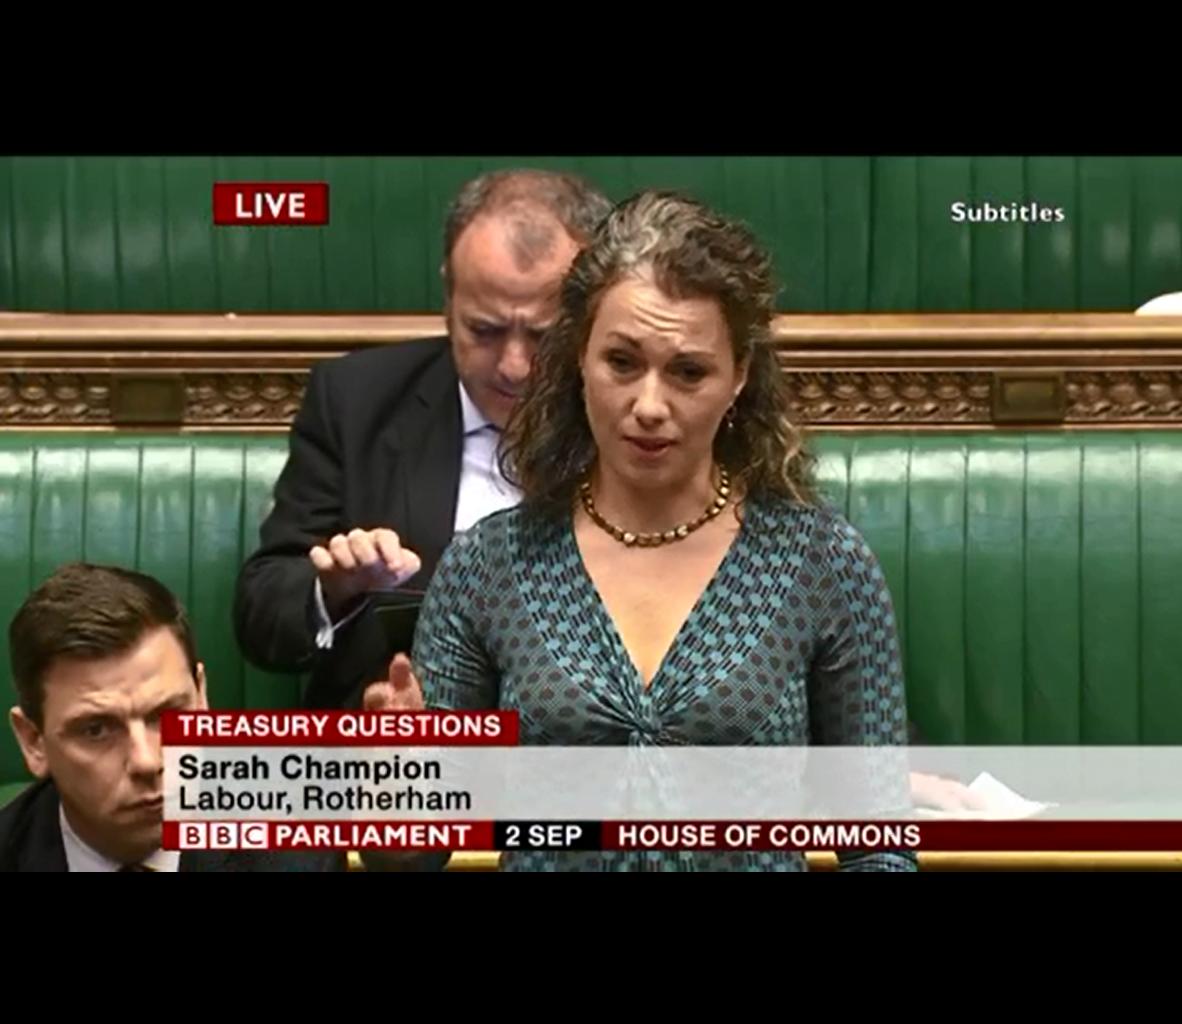 Sarah-Speaking-in-Parliament.png